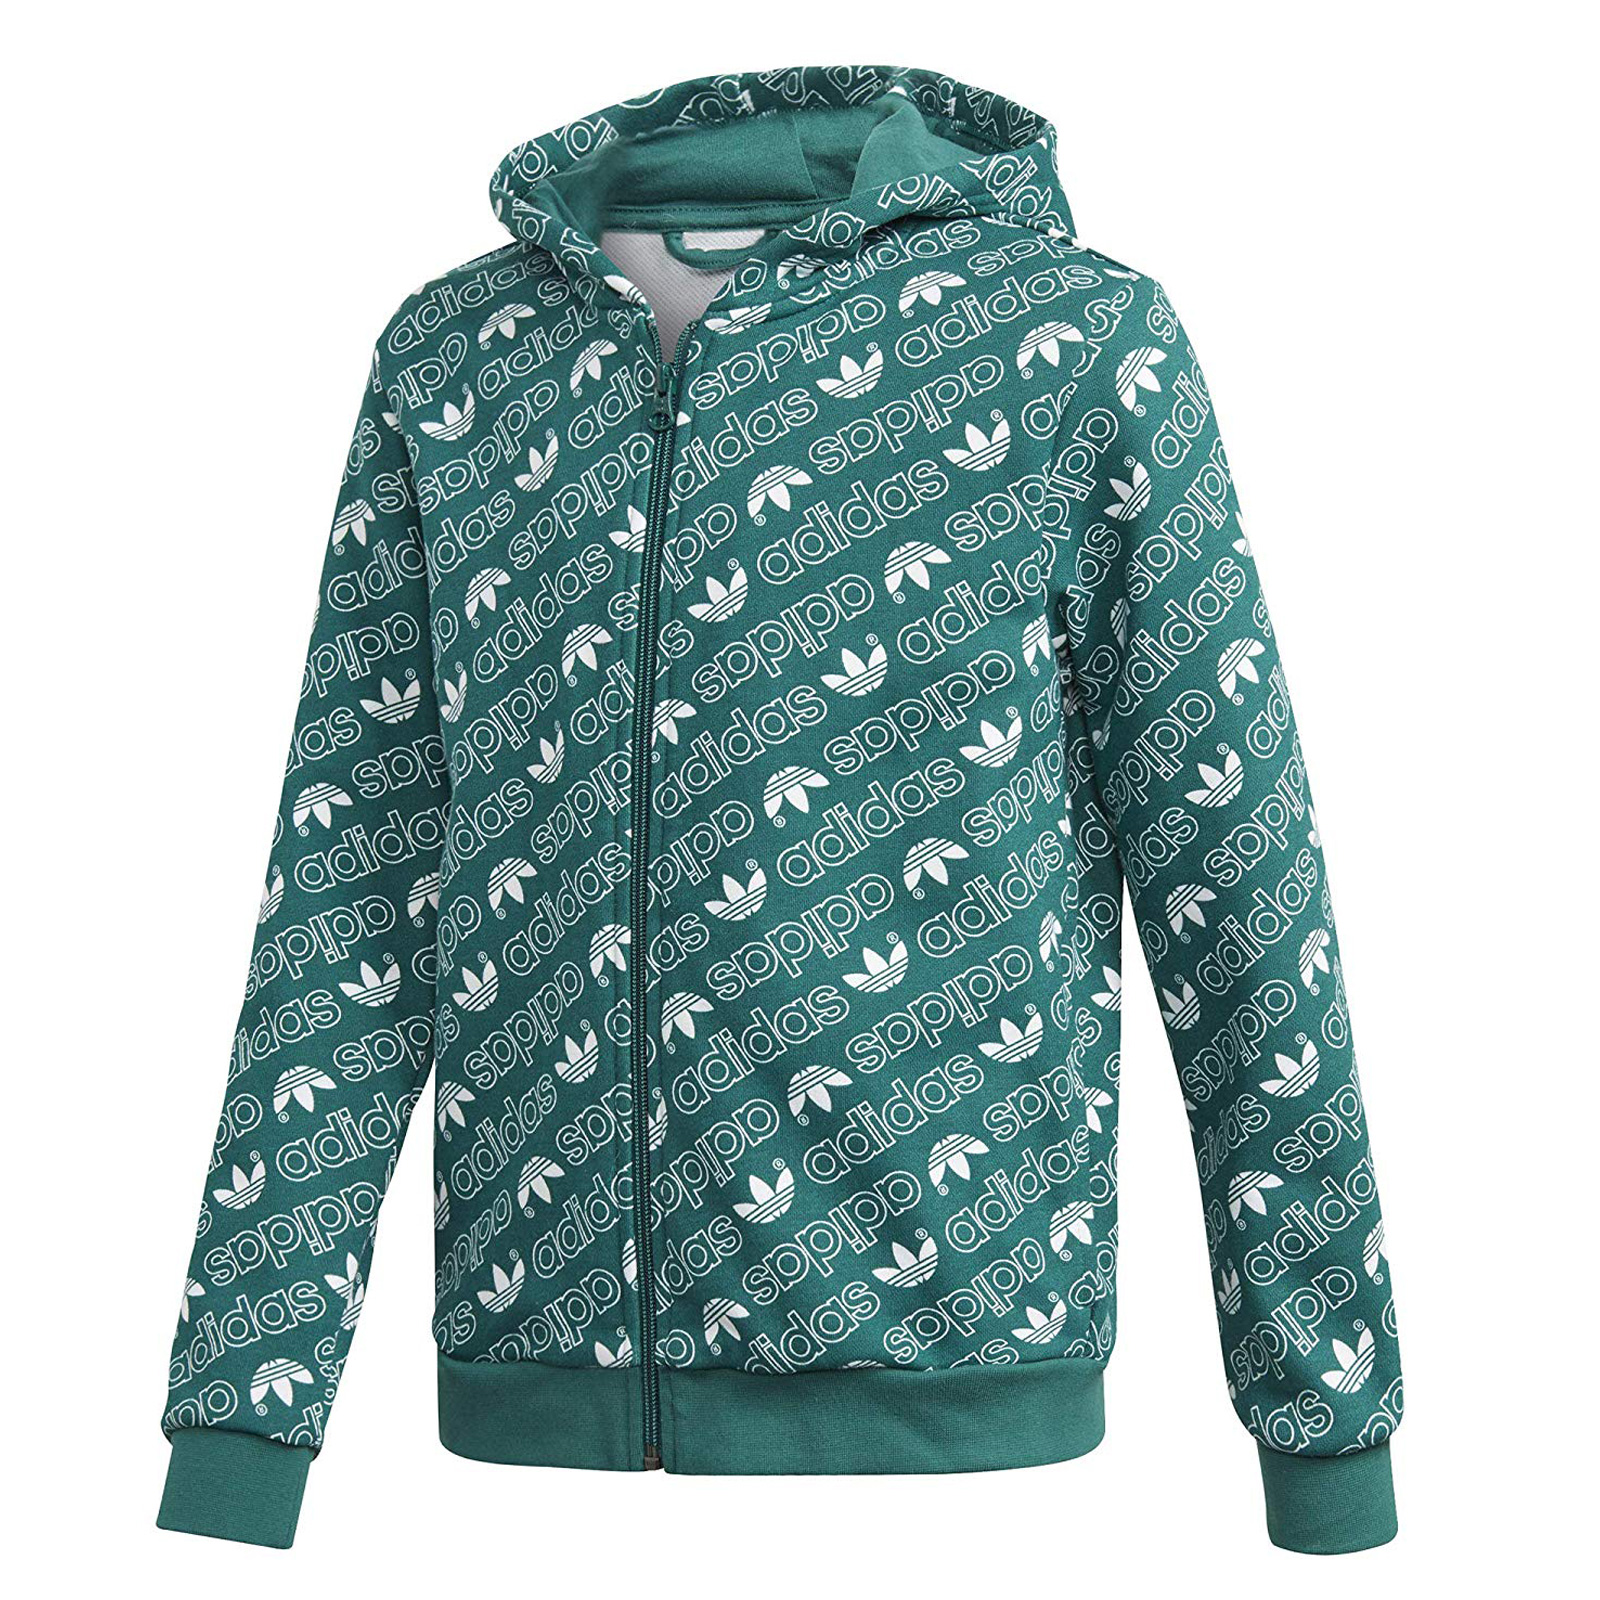 Sweat Jacket Adidas Trefoil Hoody Green Details about 140 Originals Boys Hoodie N8nOwymv0